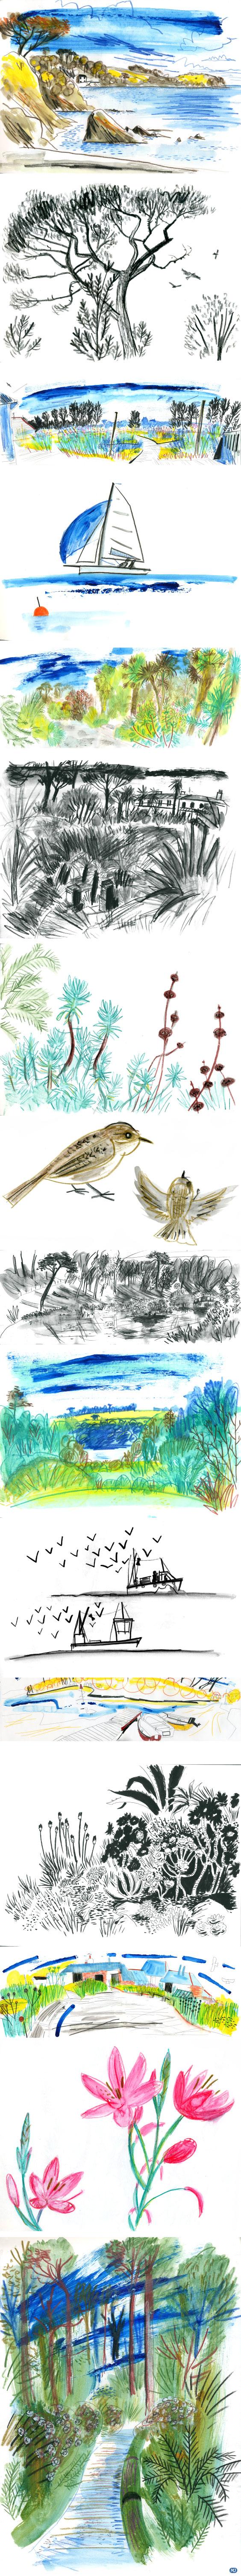 Sketchbook of Trebah Gardens, Helford River, Kestle Barton and Gyllyngdune Gardens in Falmouth